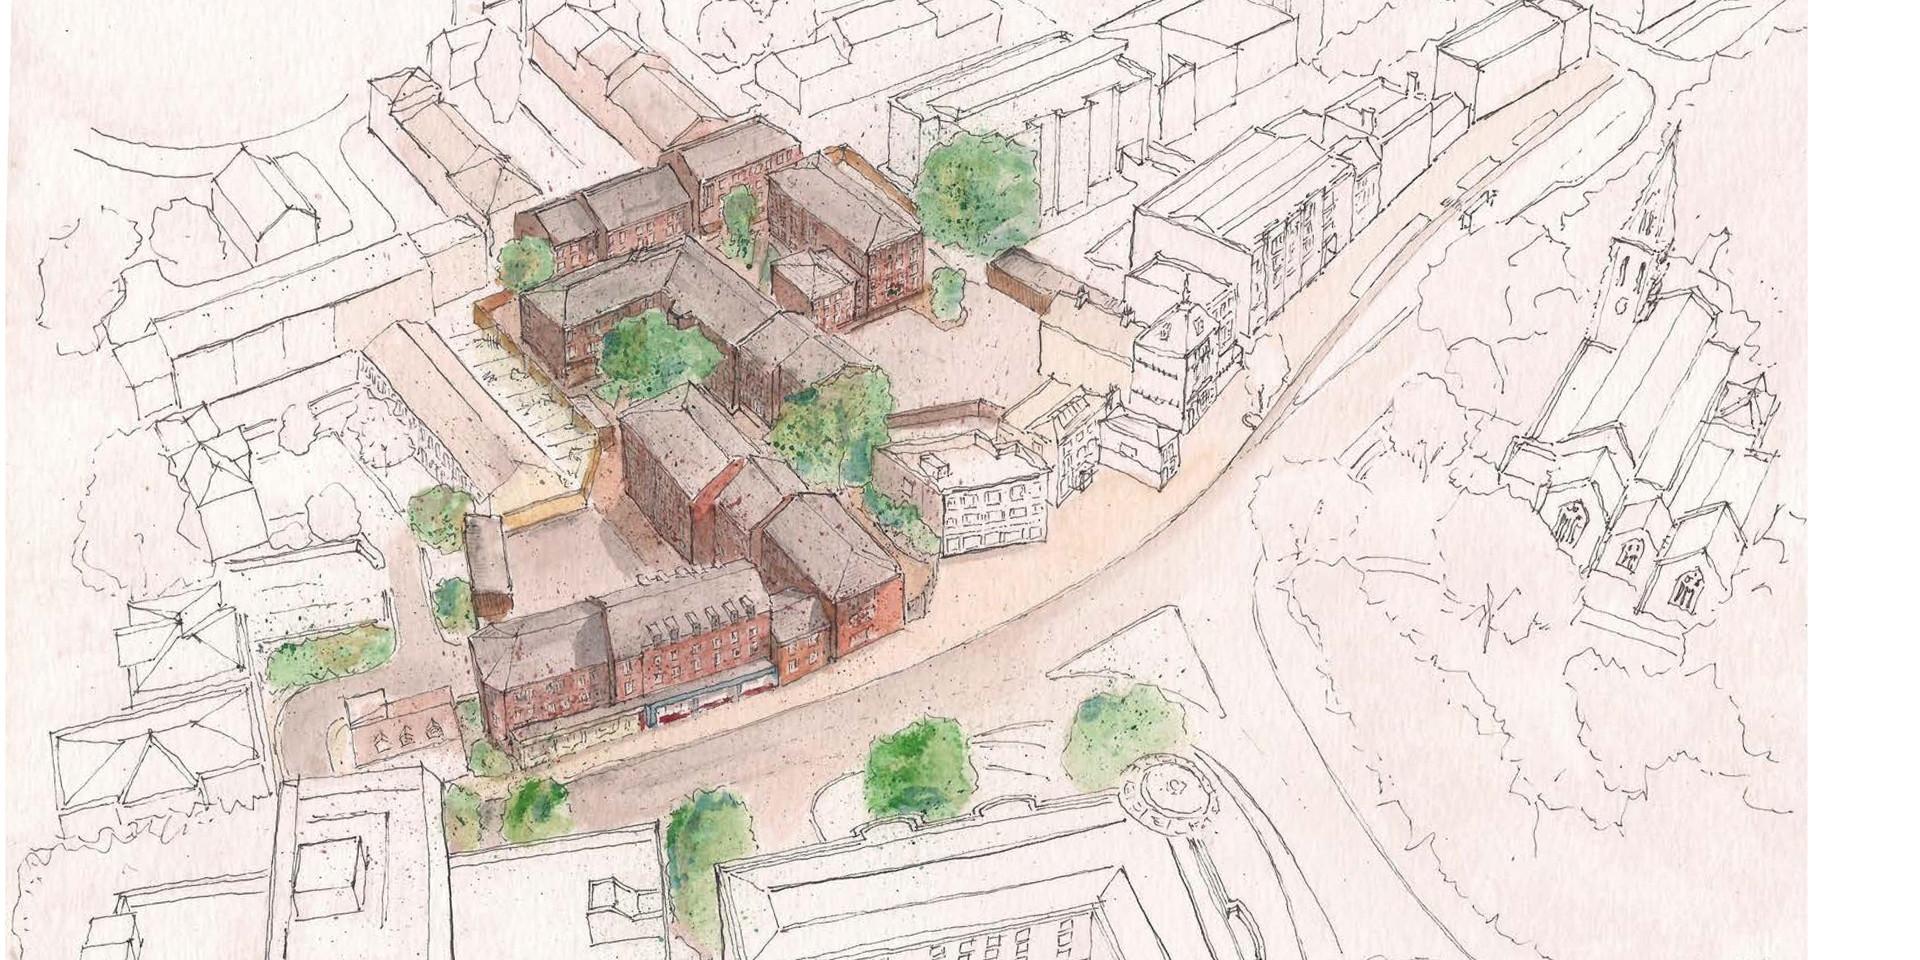 Stratford Village - London - completes Q3 2021